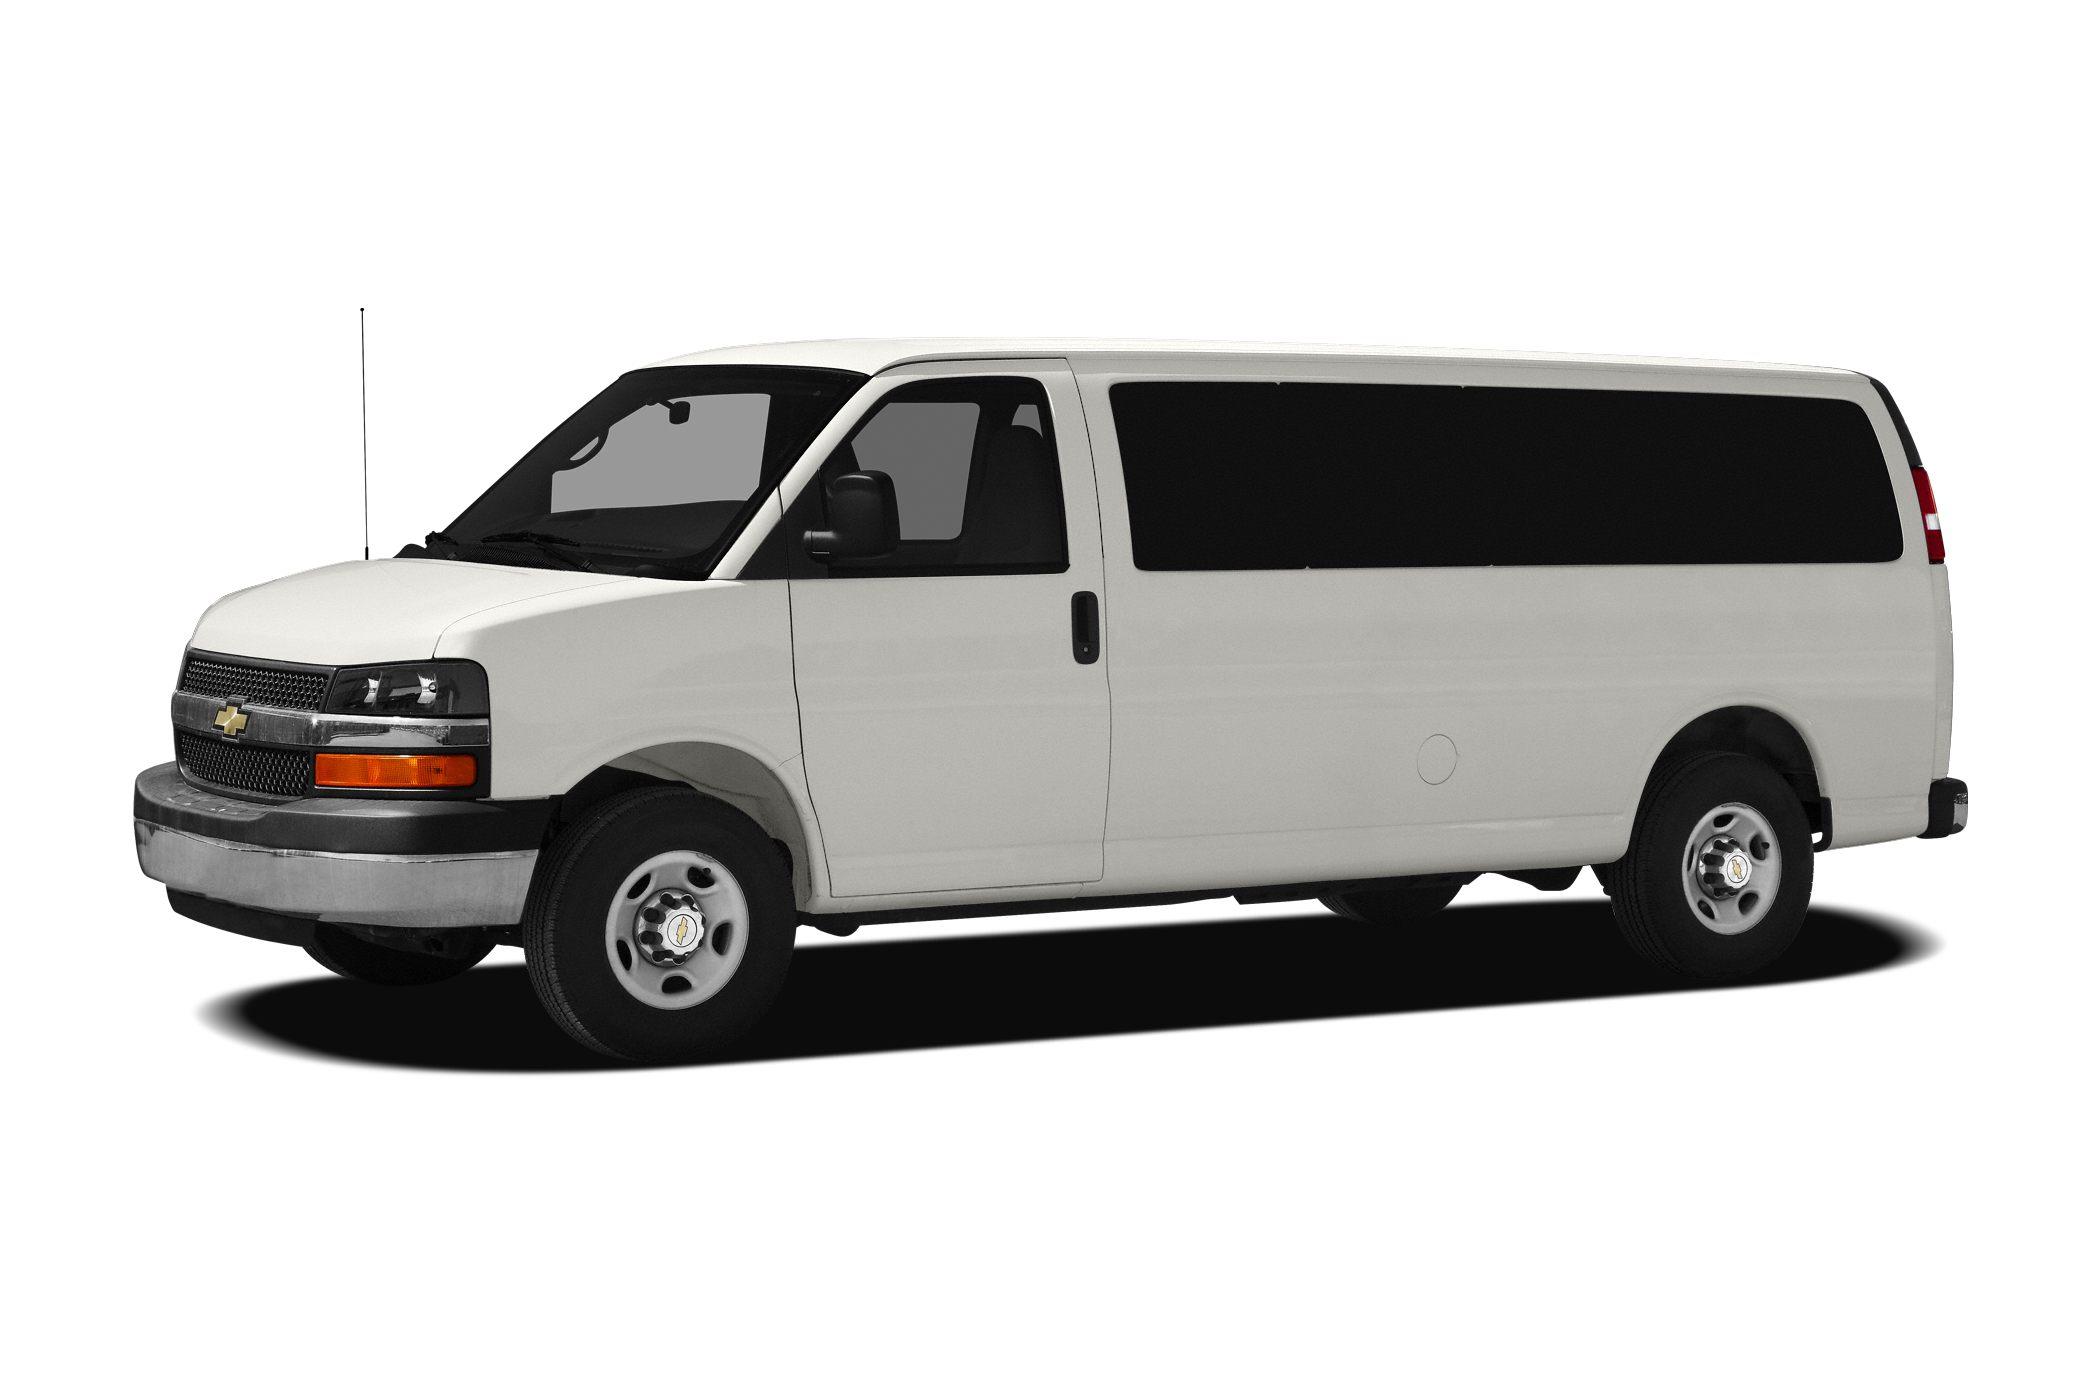 2011 Chevrolet Express 1500